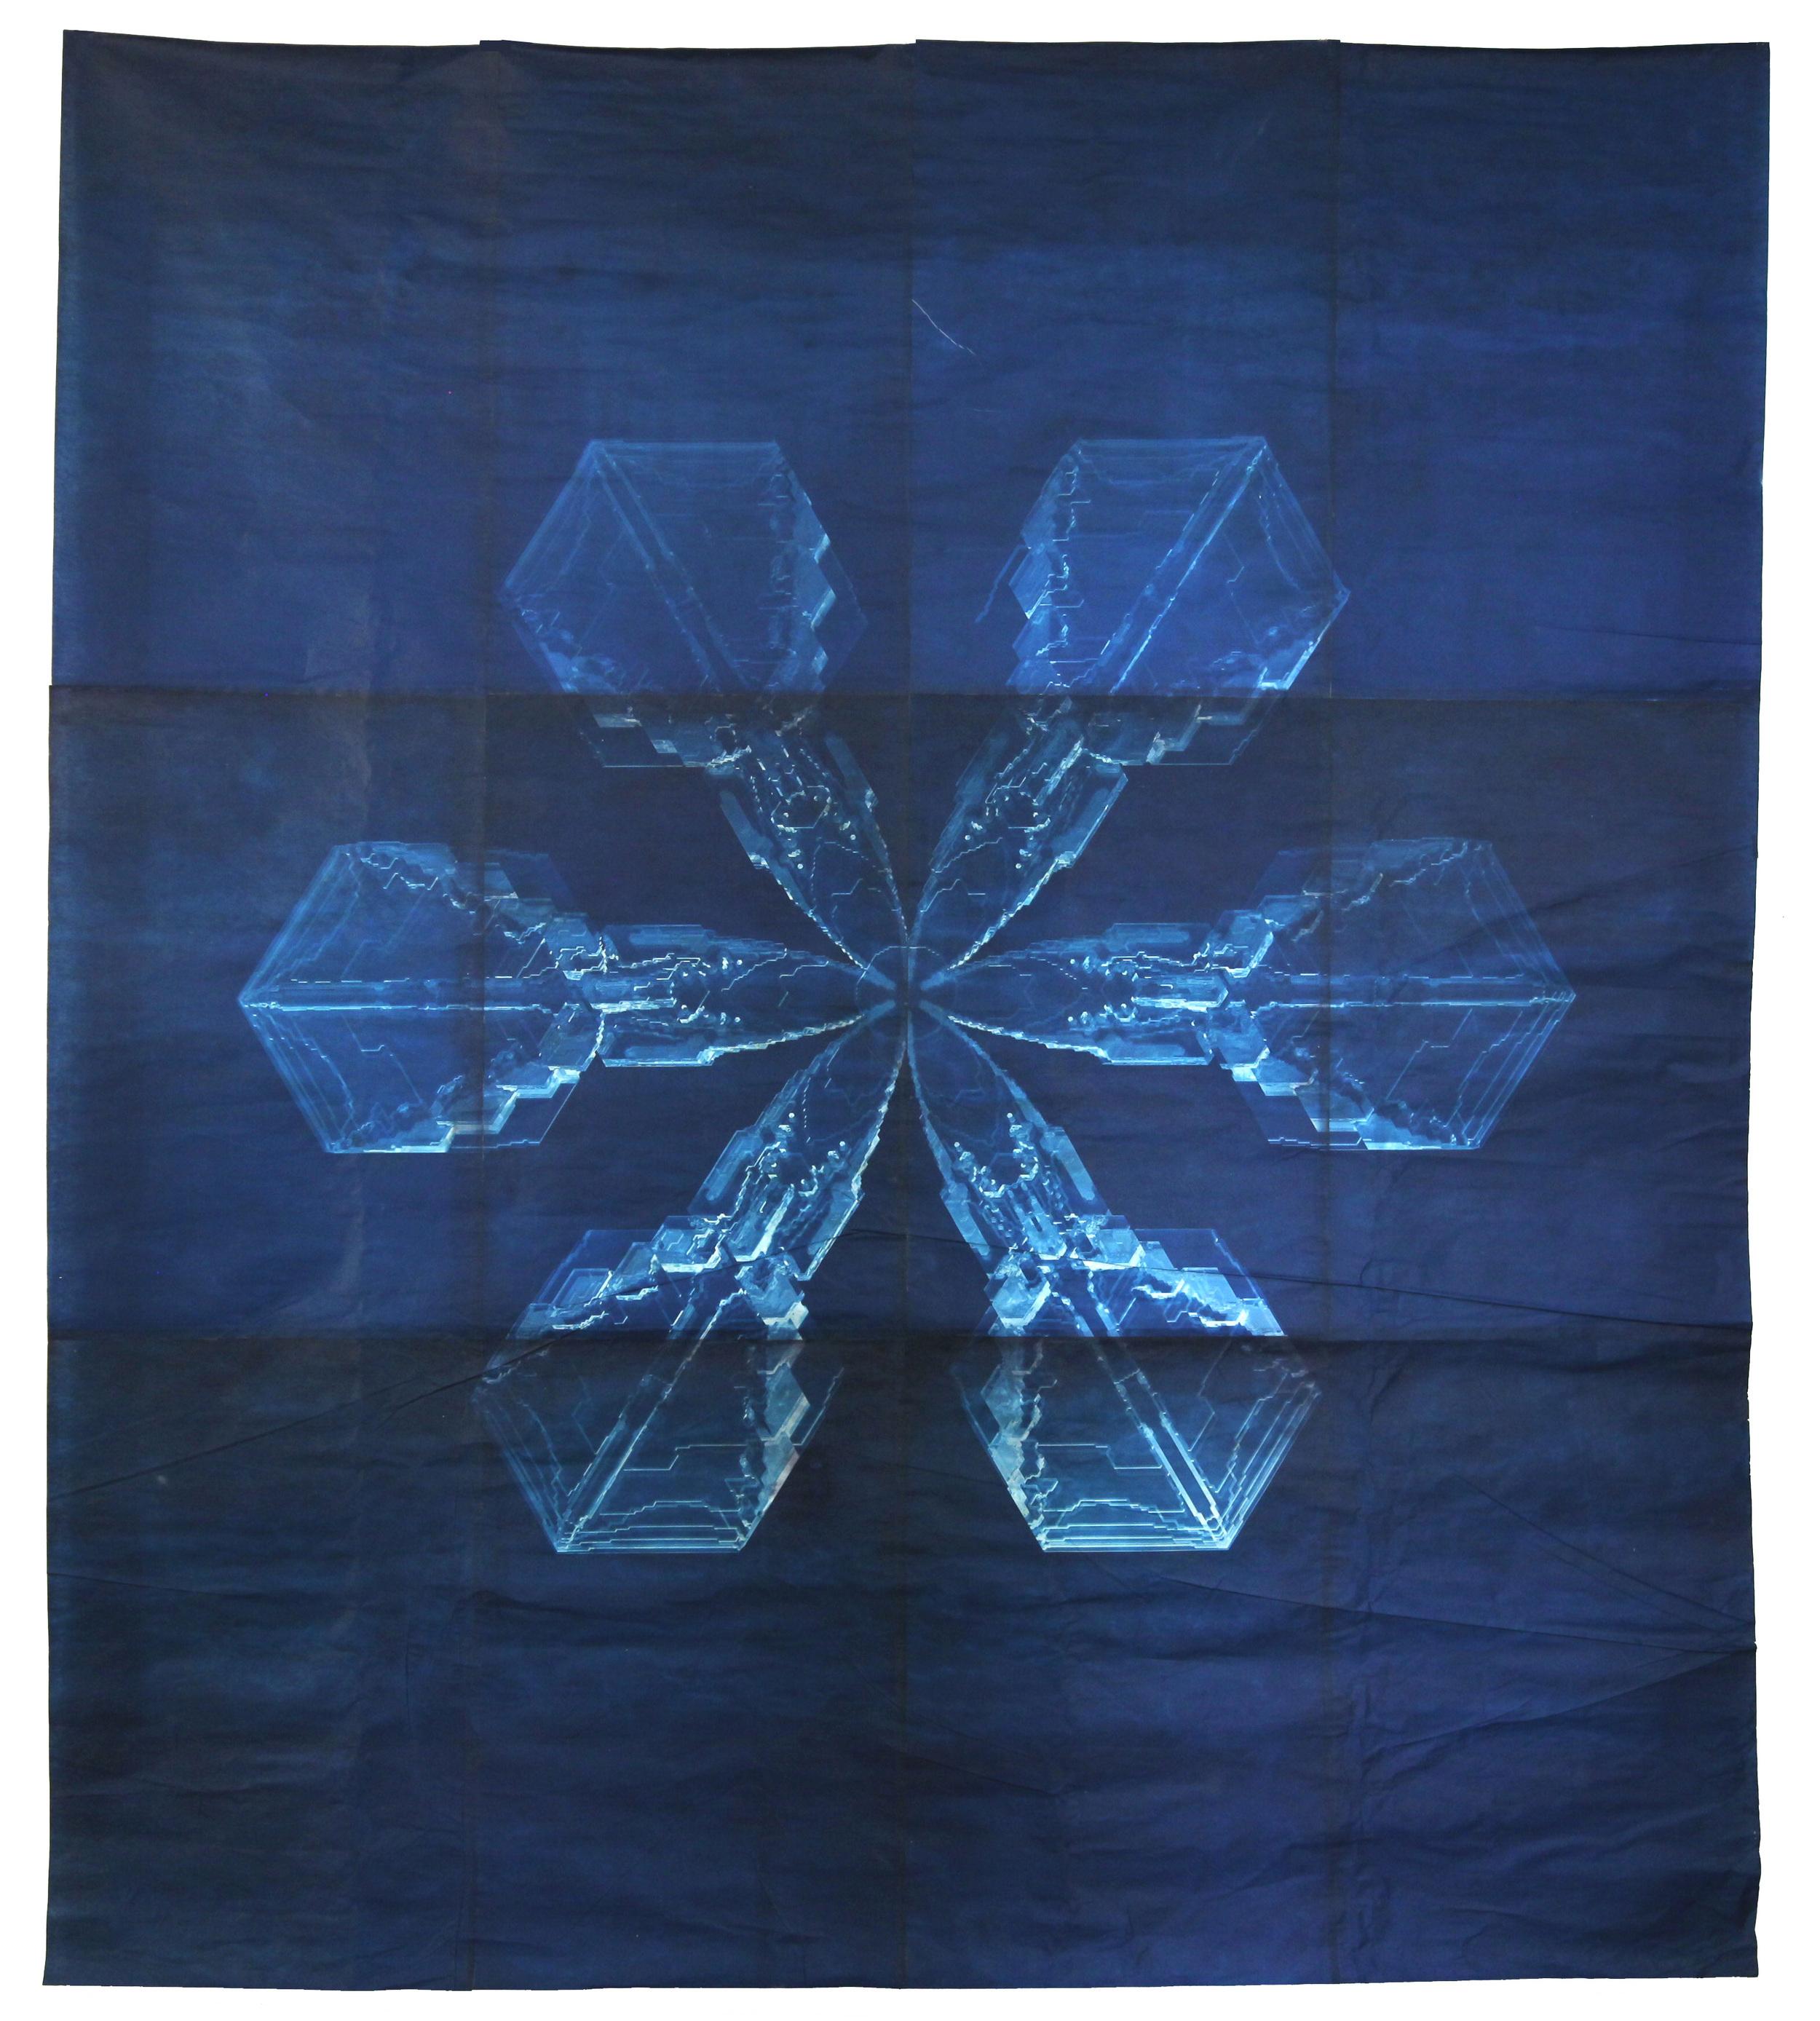 Snowflake #2, 2011